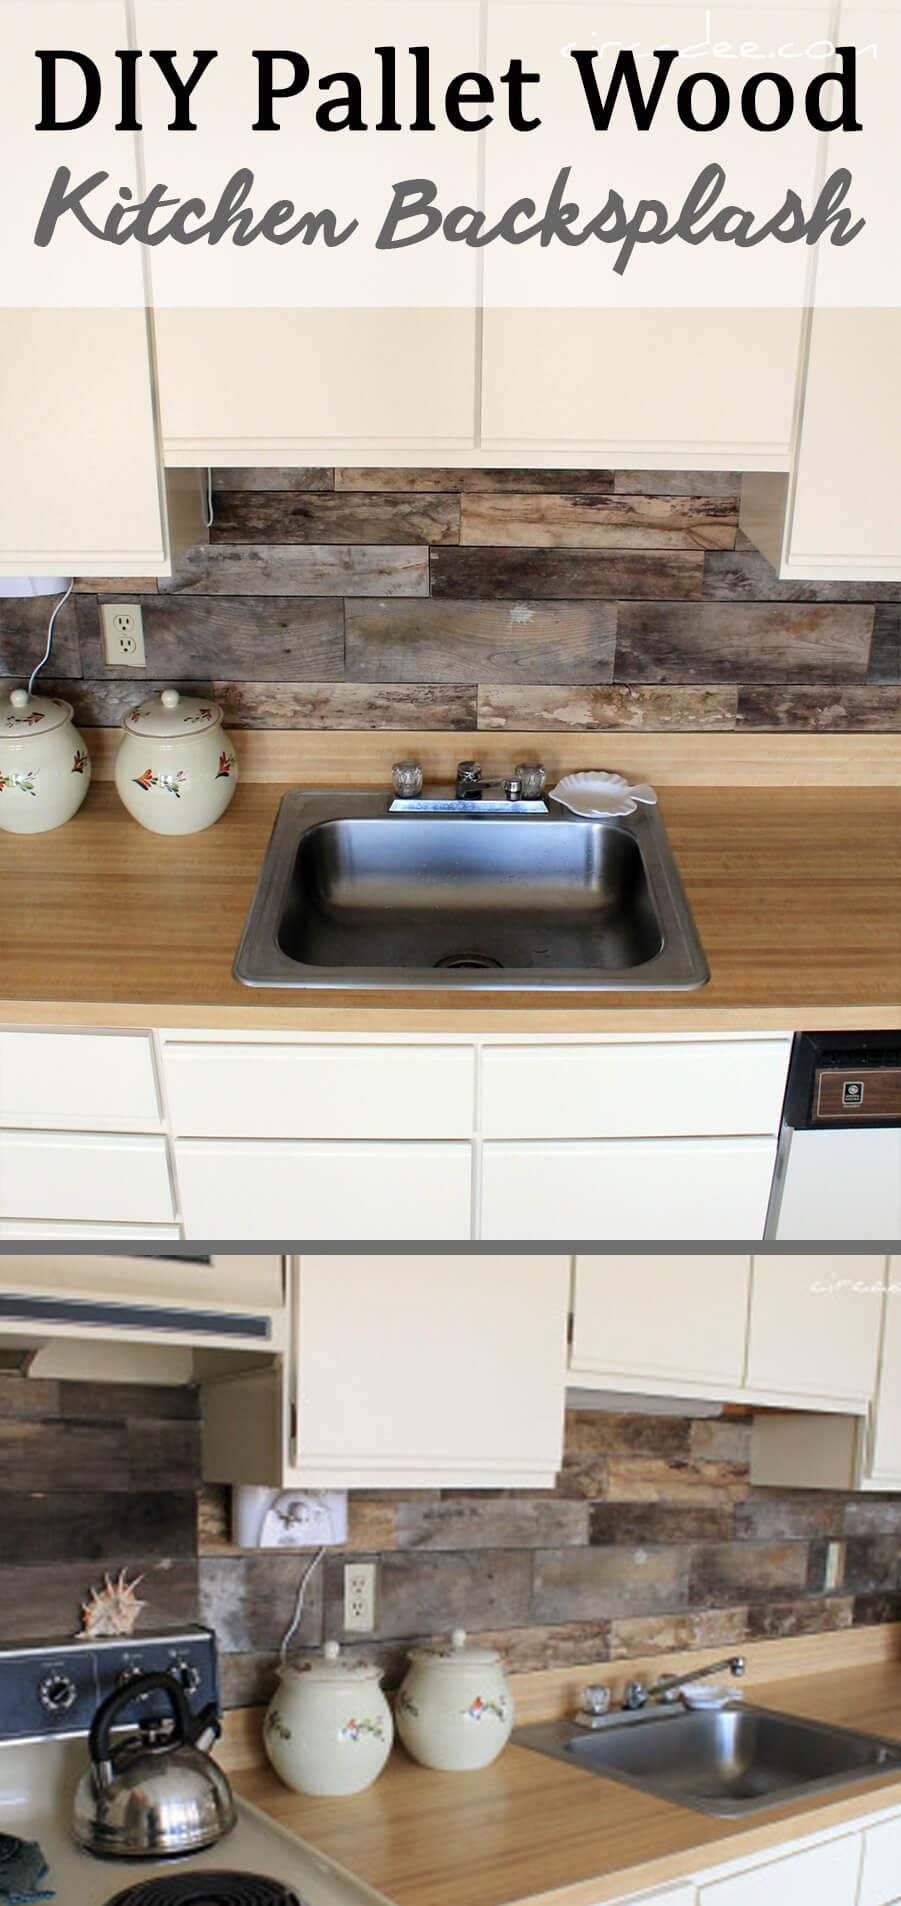 - 25+ Easy DIY Kitchen Backsplash Ideas To Breathe New Life Into